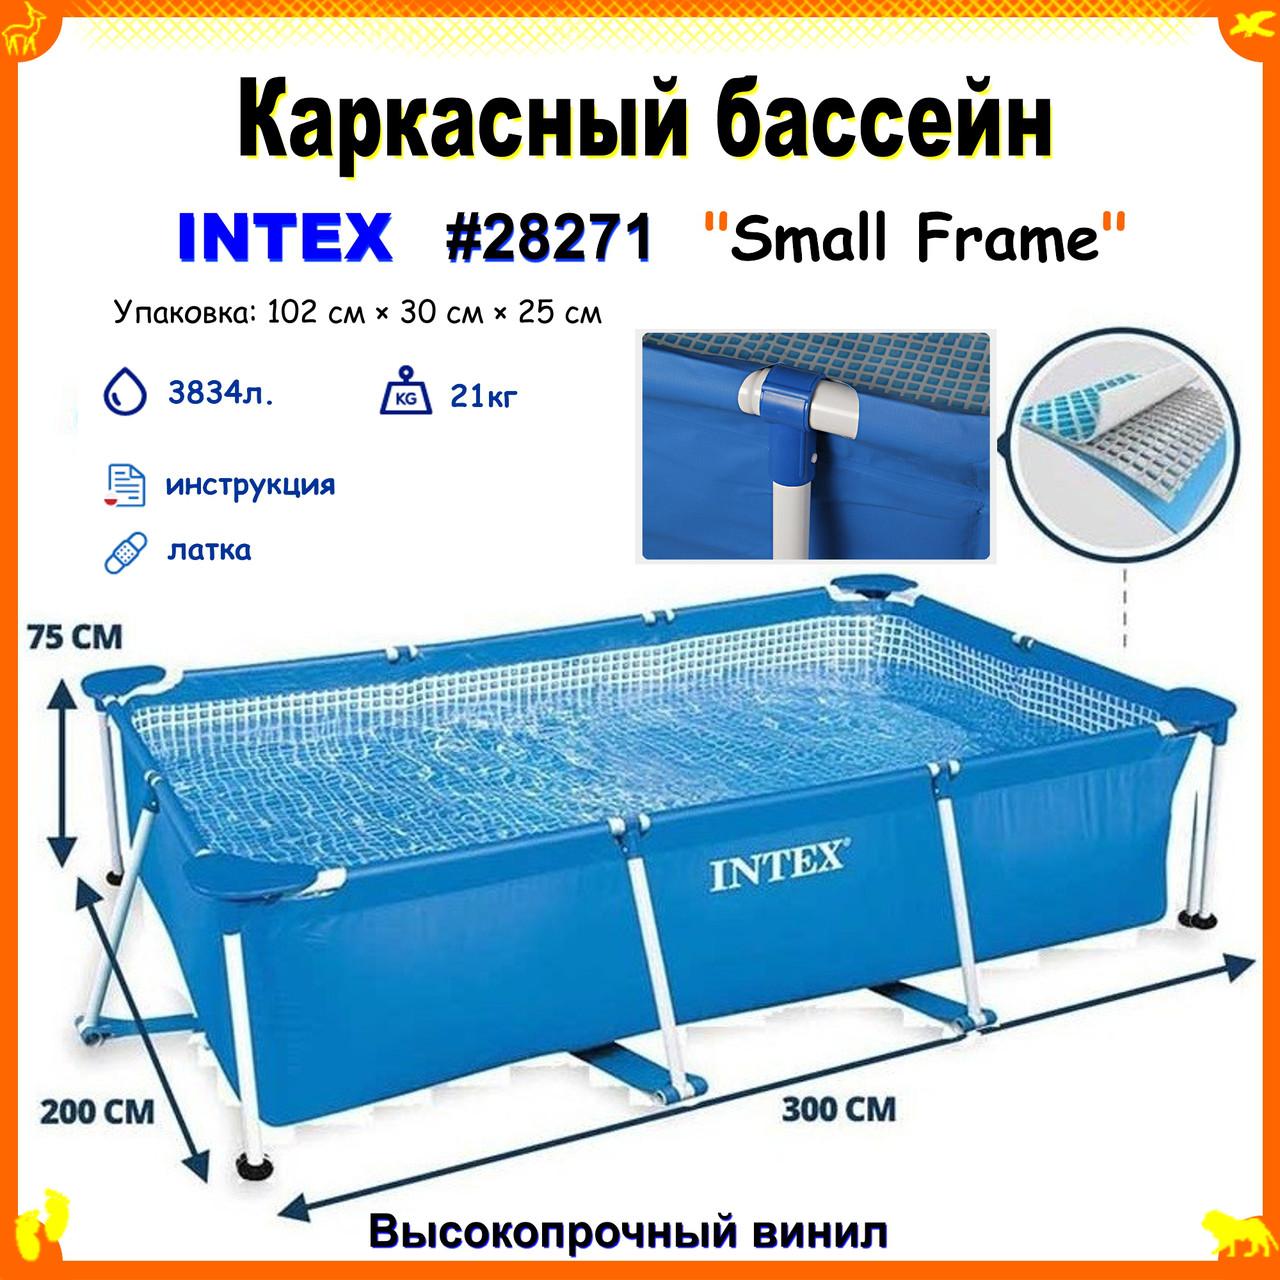 Каркасный бассейн Intex 28272 (58981) новая 0.5.17